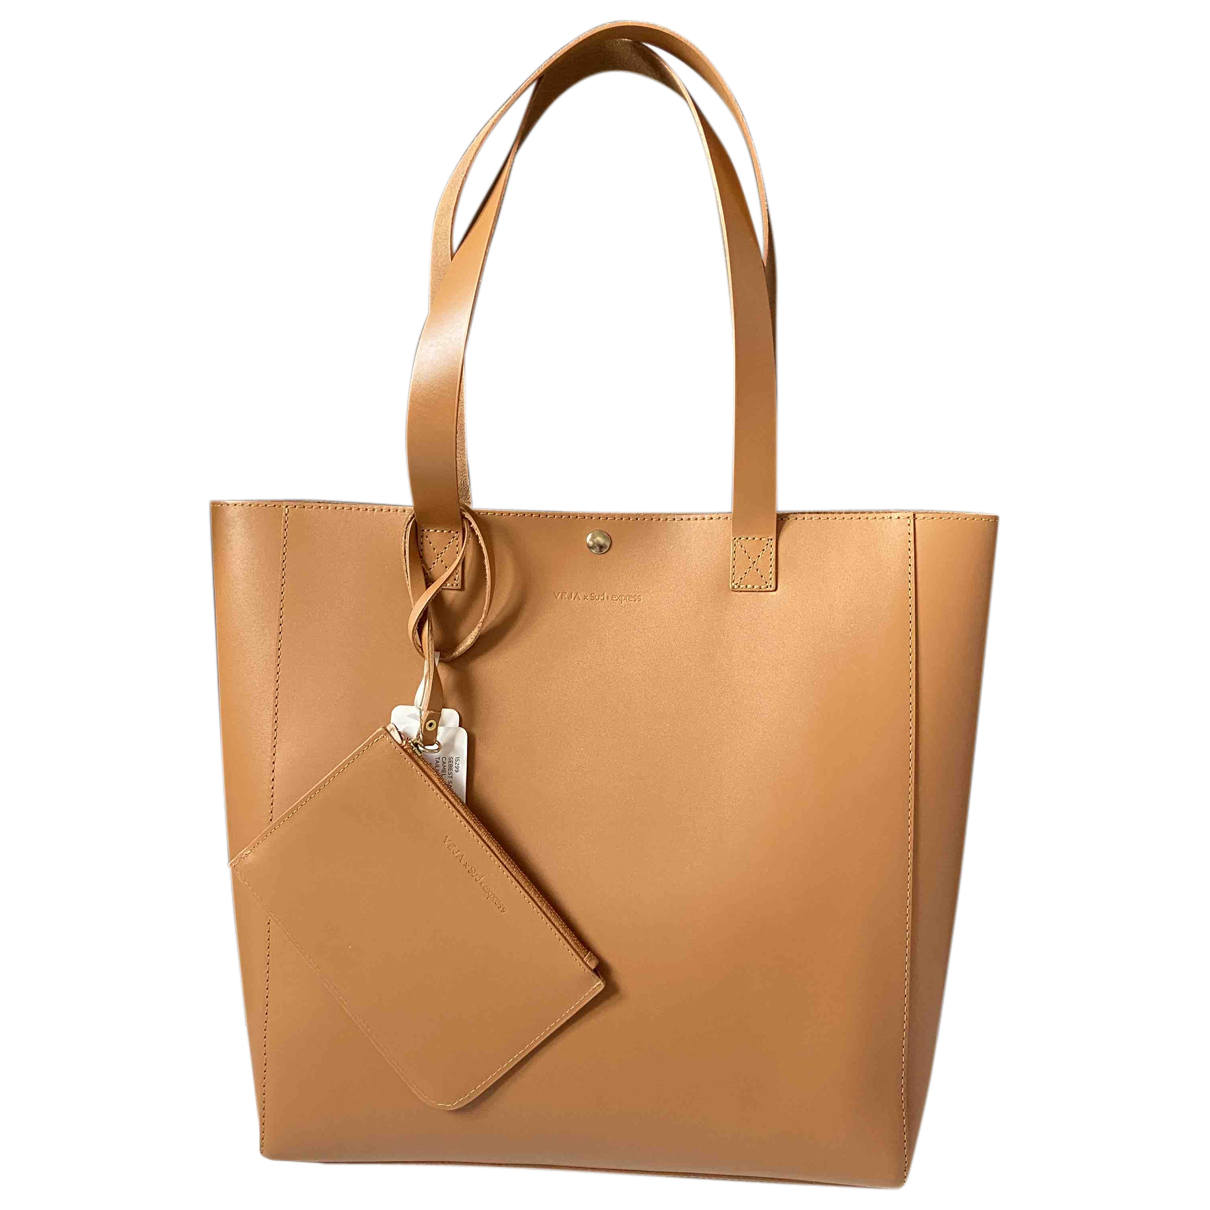 Sud Express N Camel Leather handbag for Women N